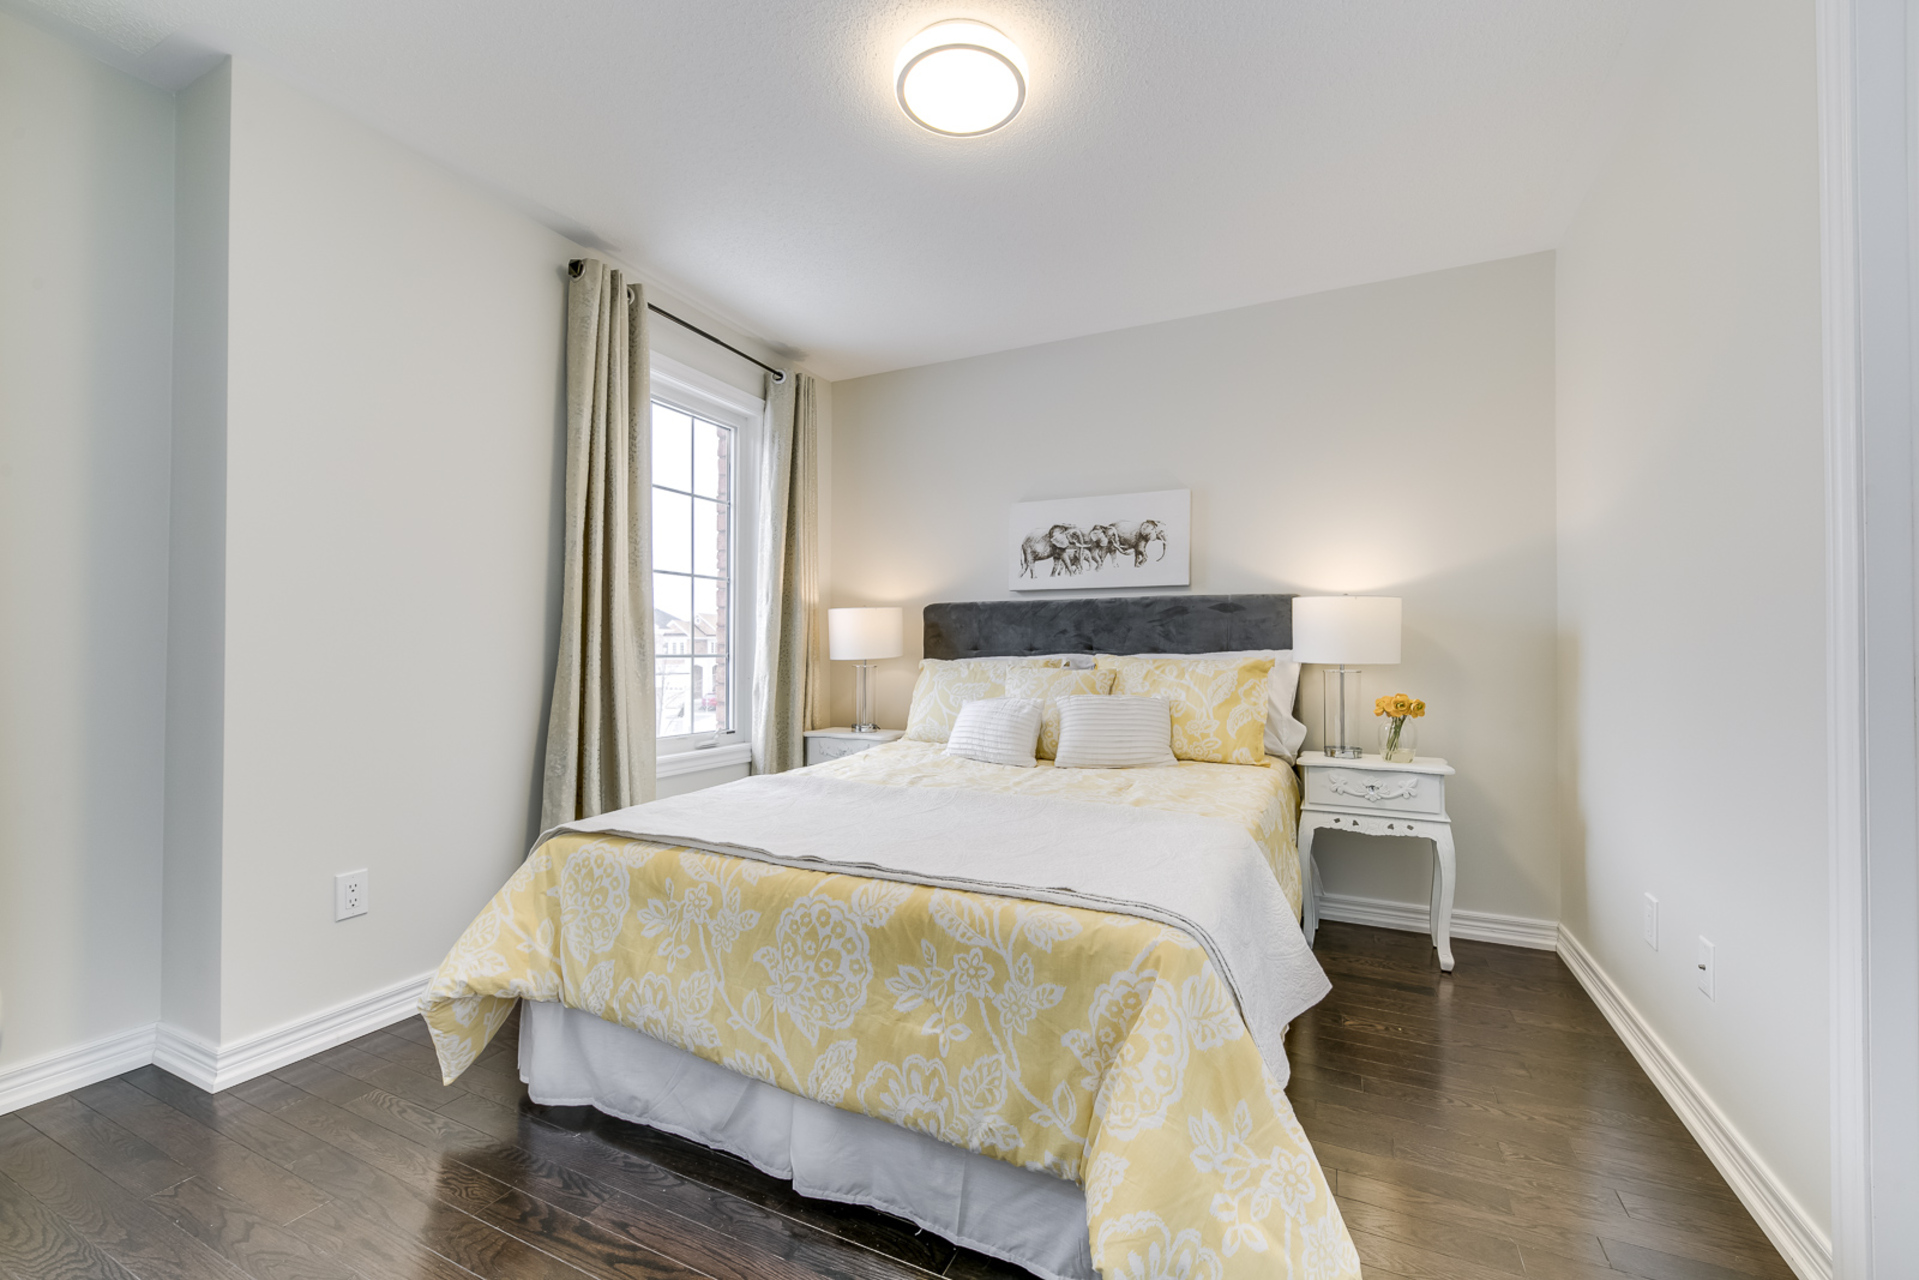 2nd Bedroom - 31 Beacon Point St,  Markham - Elite3 & Team at 31 Beacon Point Street, Wismer, Markham